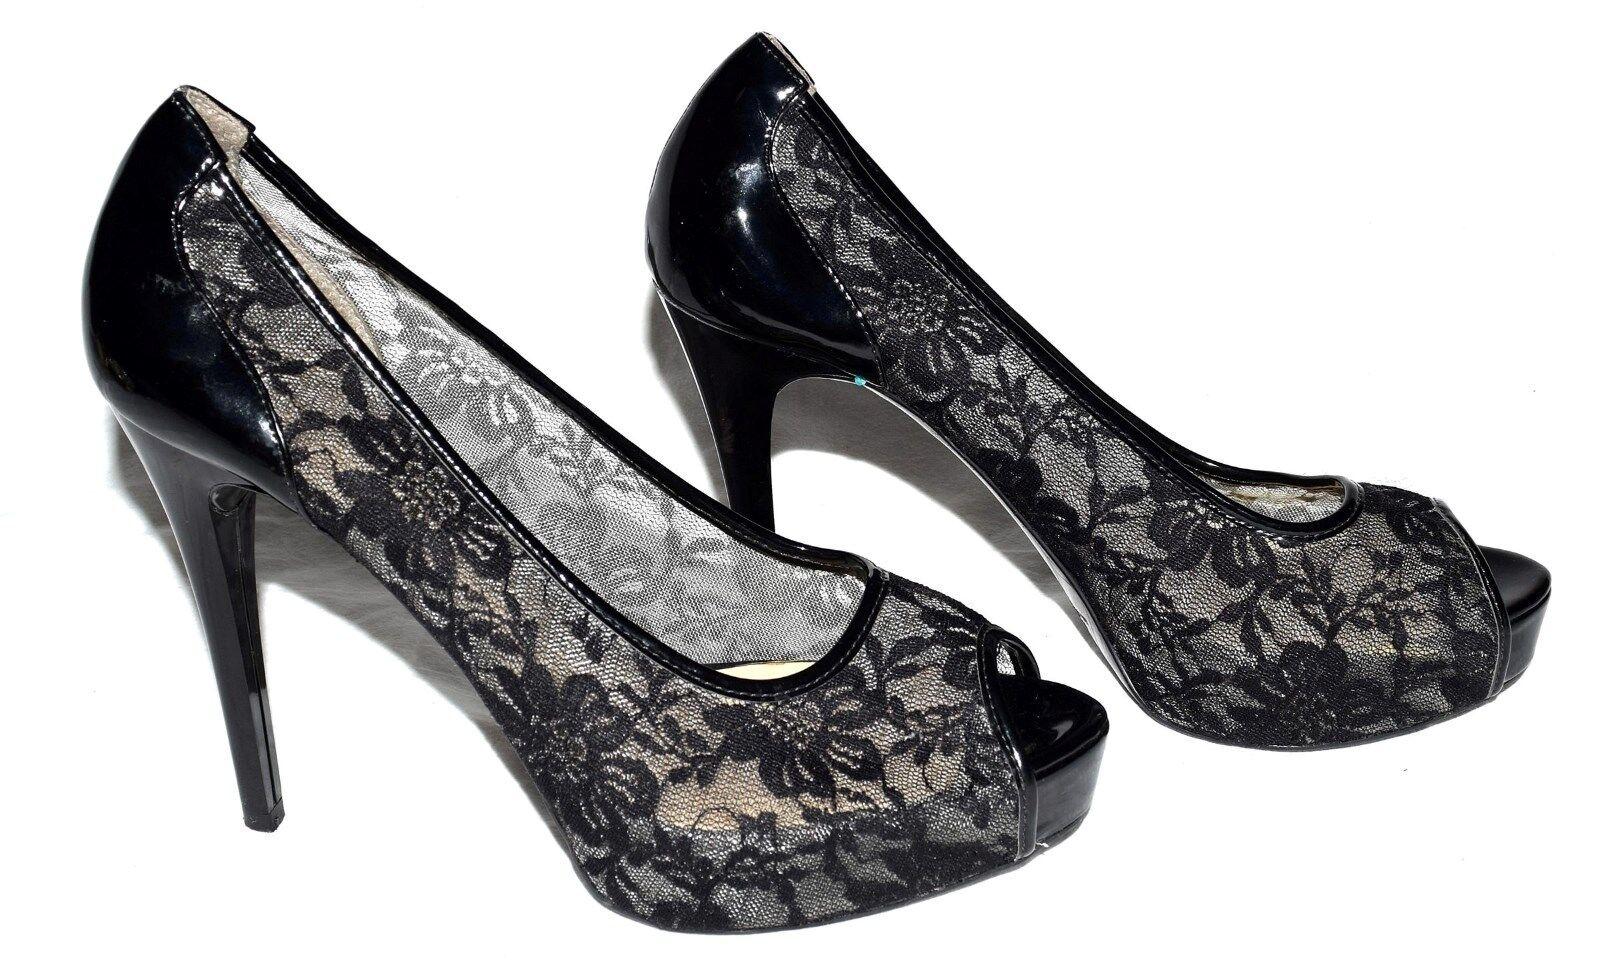 GUESS Gaminata Black Lace Faux Patent Leather Stiletto Heels w  Peep Toe Sz 10 M